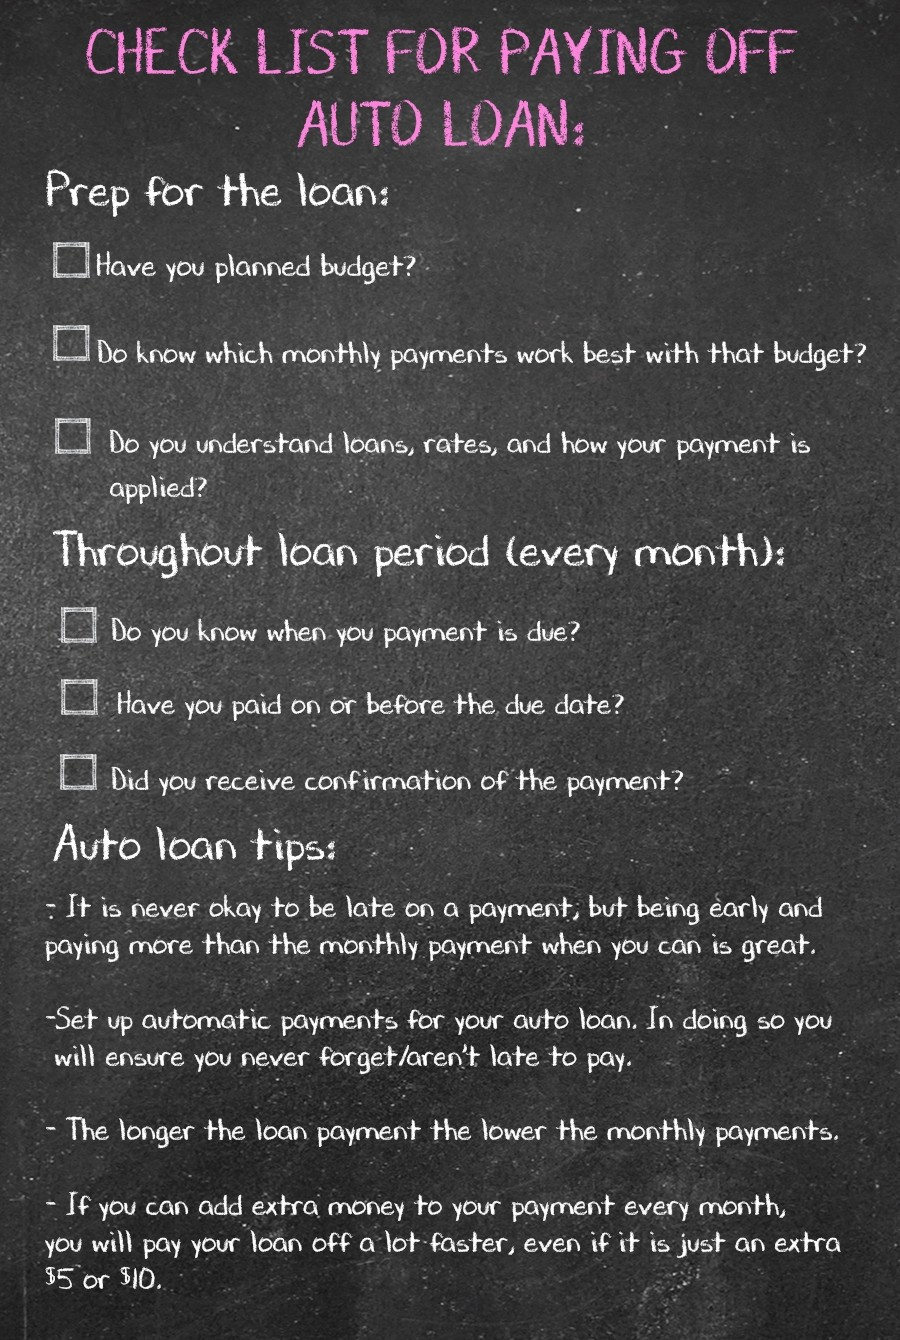 pay off a loan advice